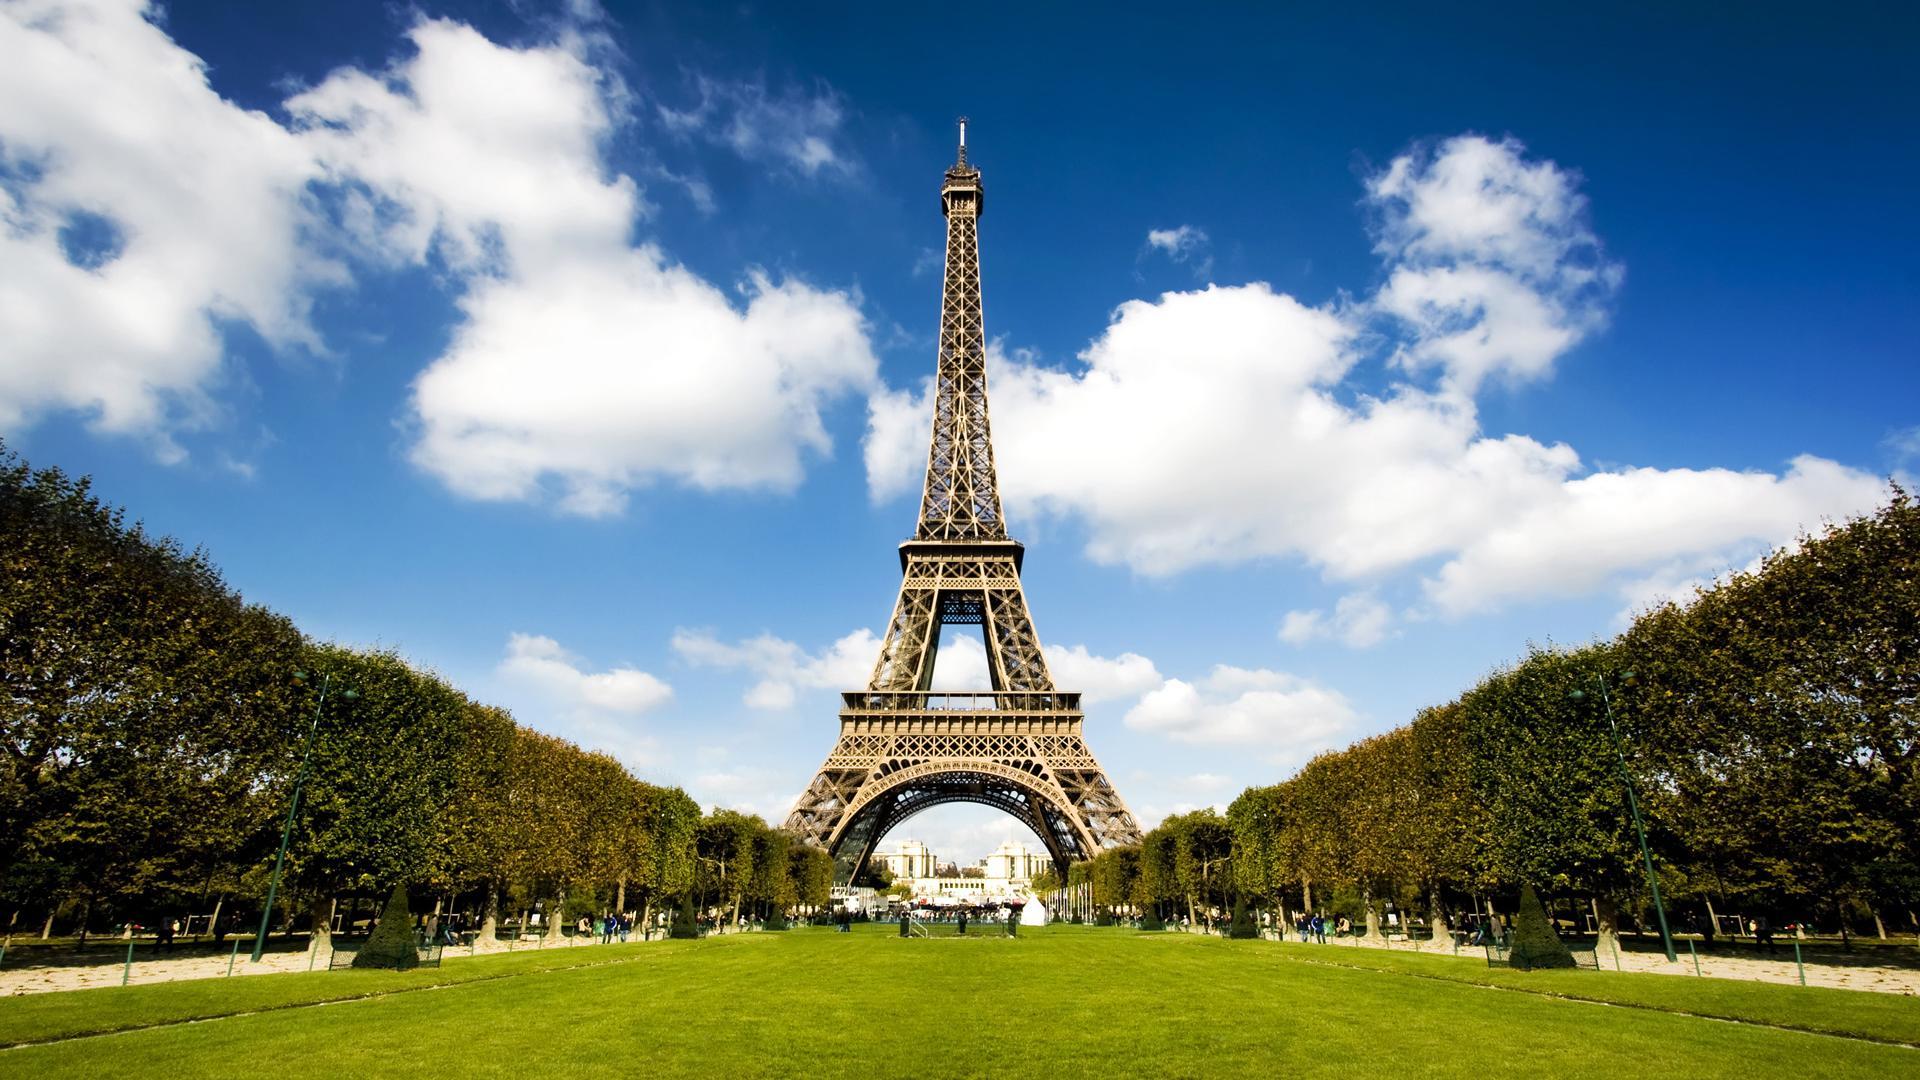 wallpapersxl-eiffel-tower-paris-france-park-cities-303722-1920x1080